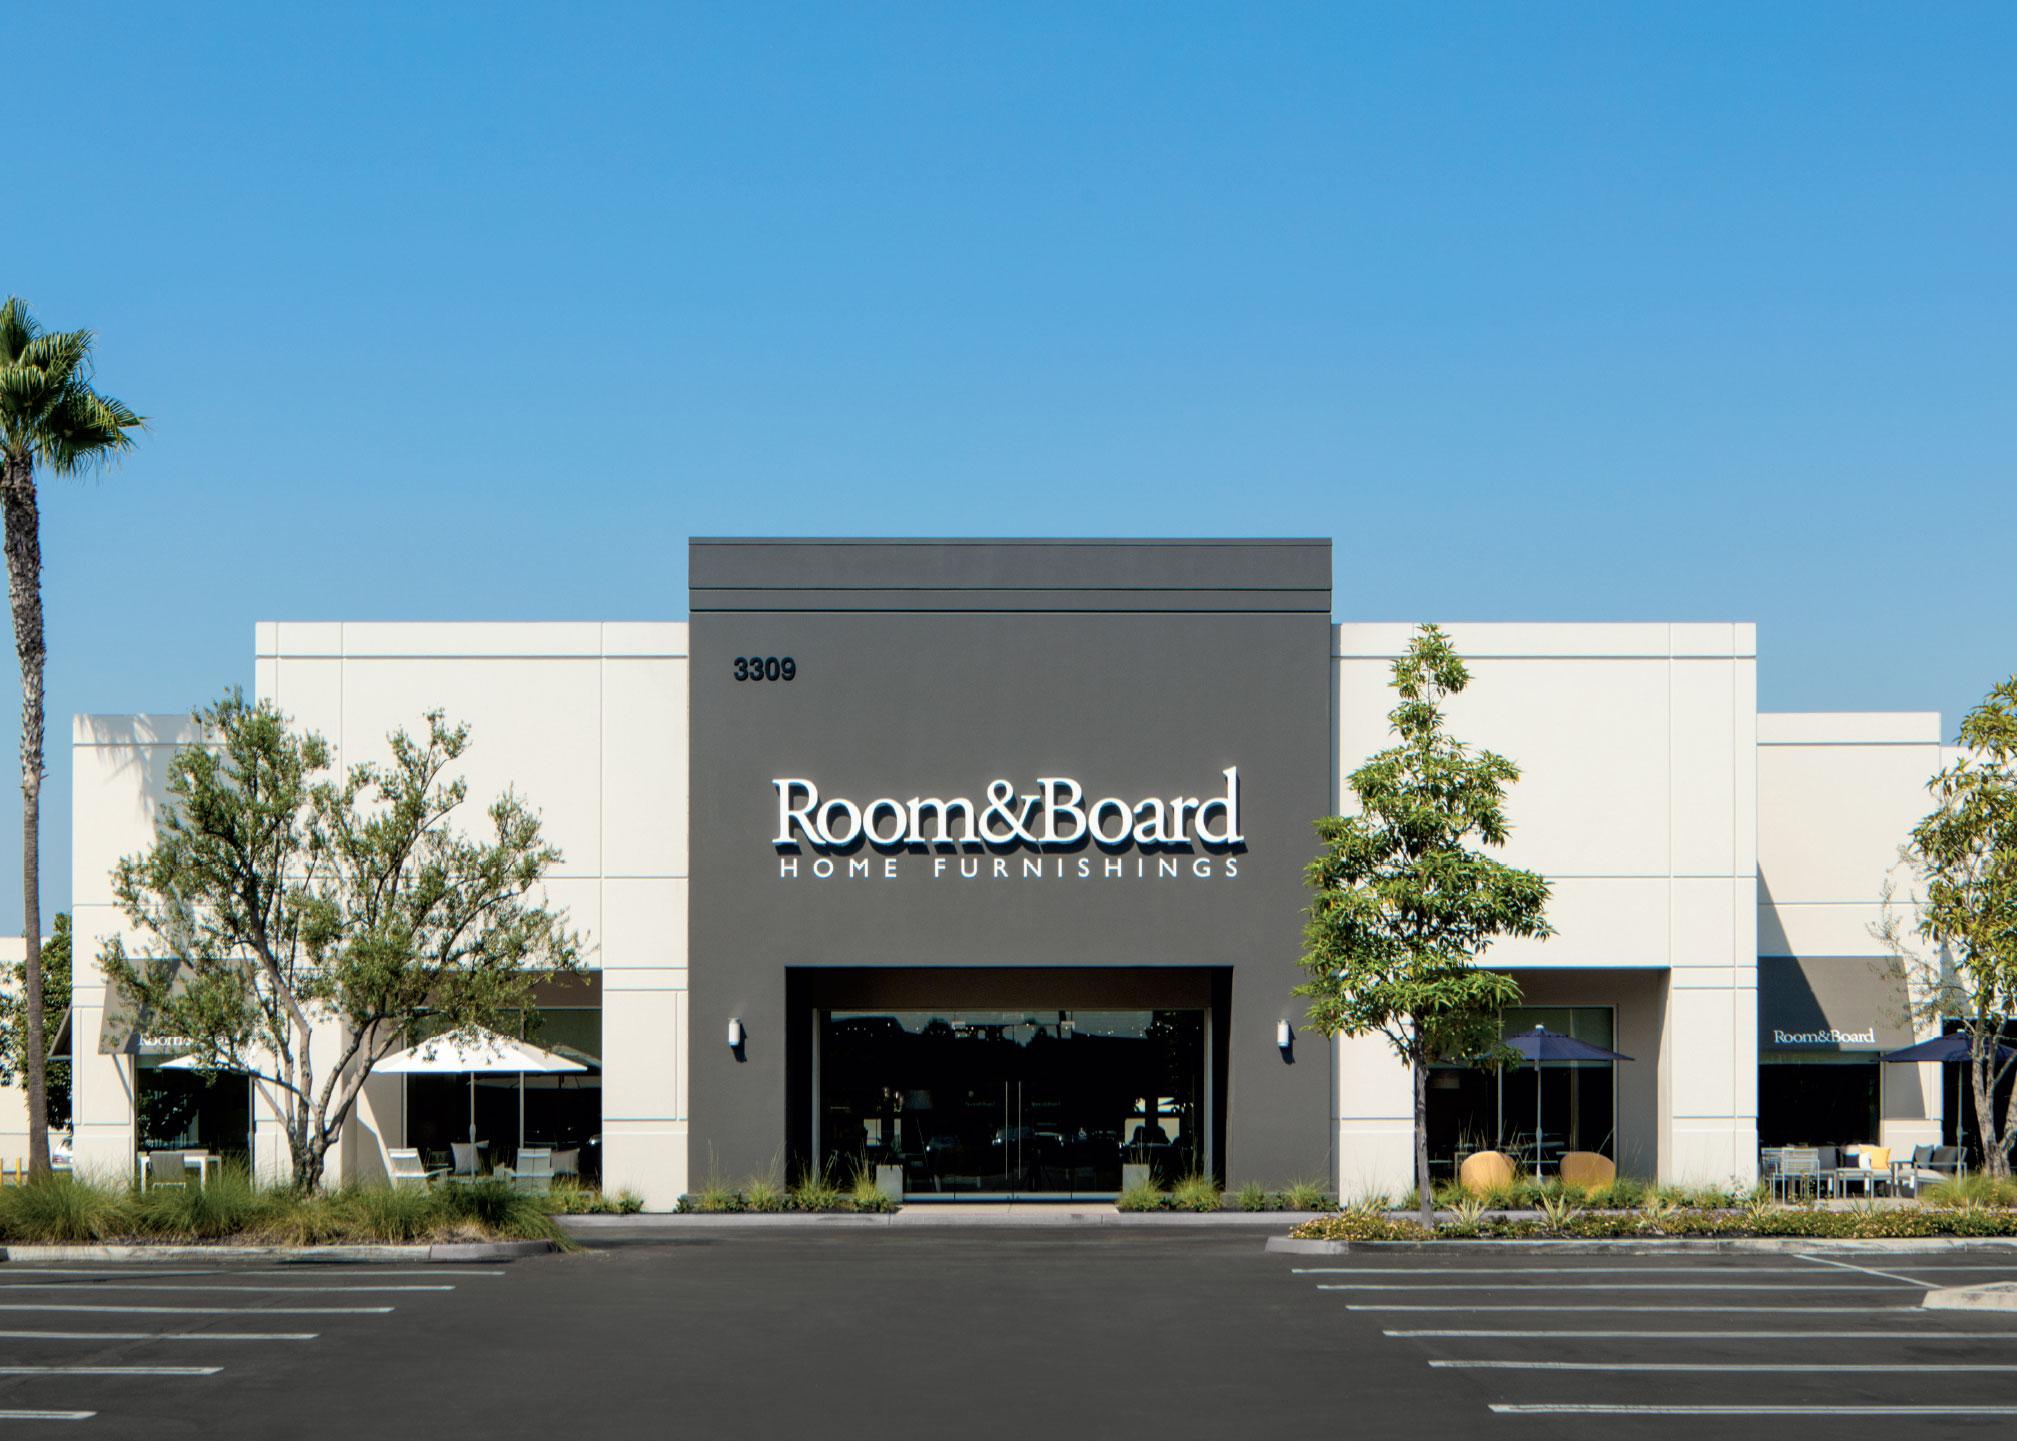 room-and-board-2017-2.jpg